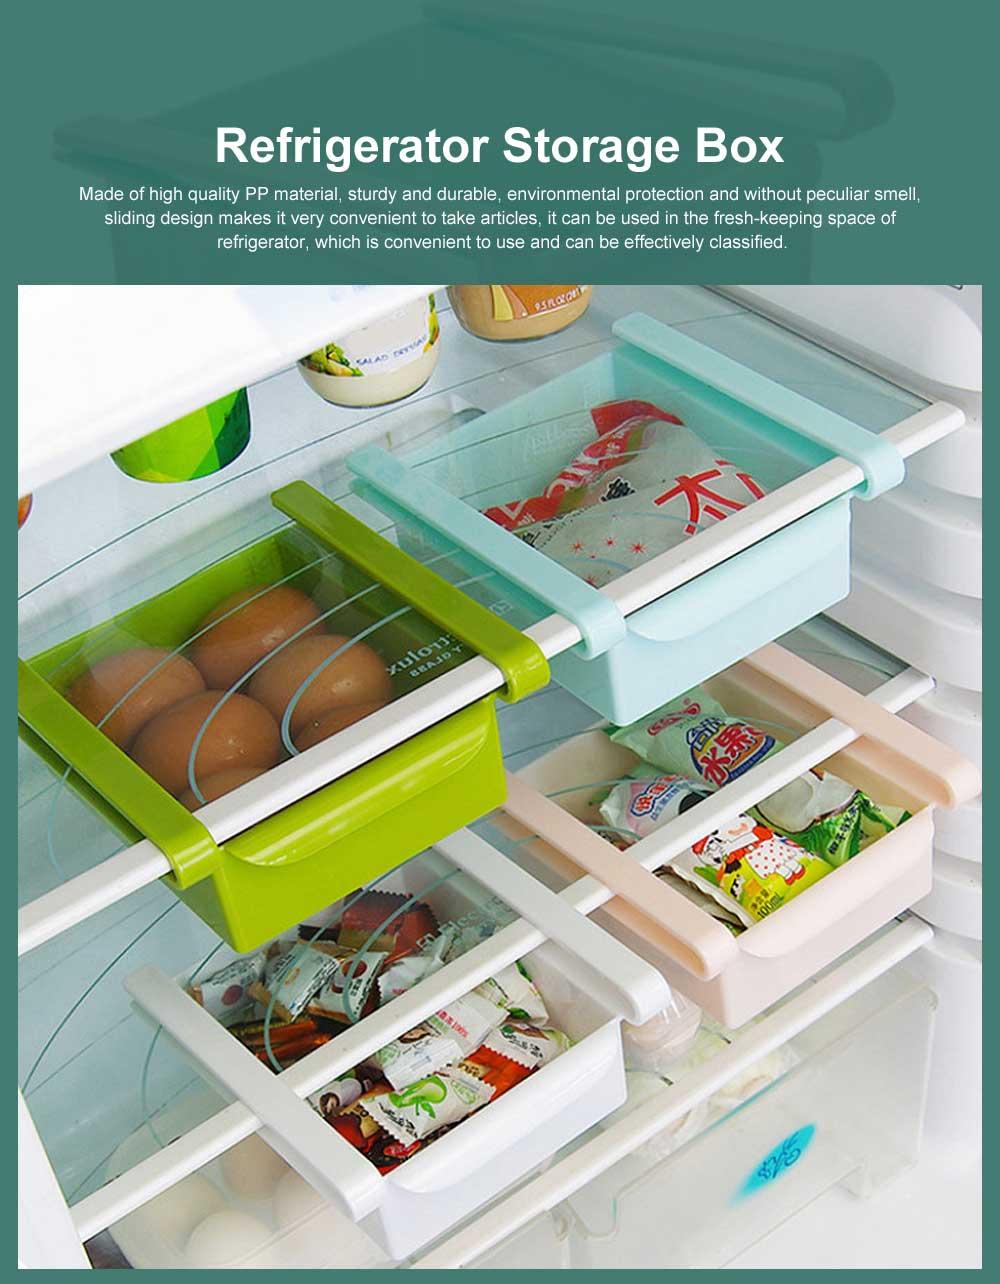 Refrigerator Storage Box, PP Kitchen Drawer-type Preservation Box, Refrigerator Interlayer Tray Commodity Shelf Organizer Container 0